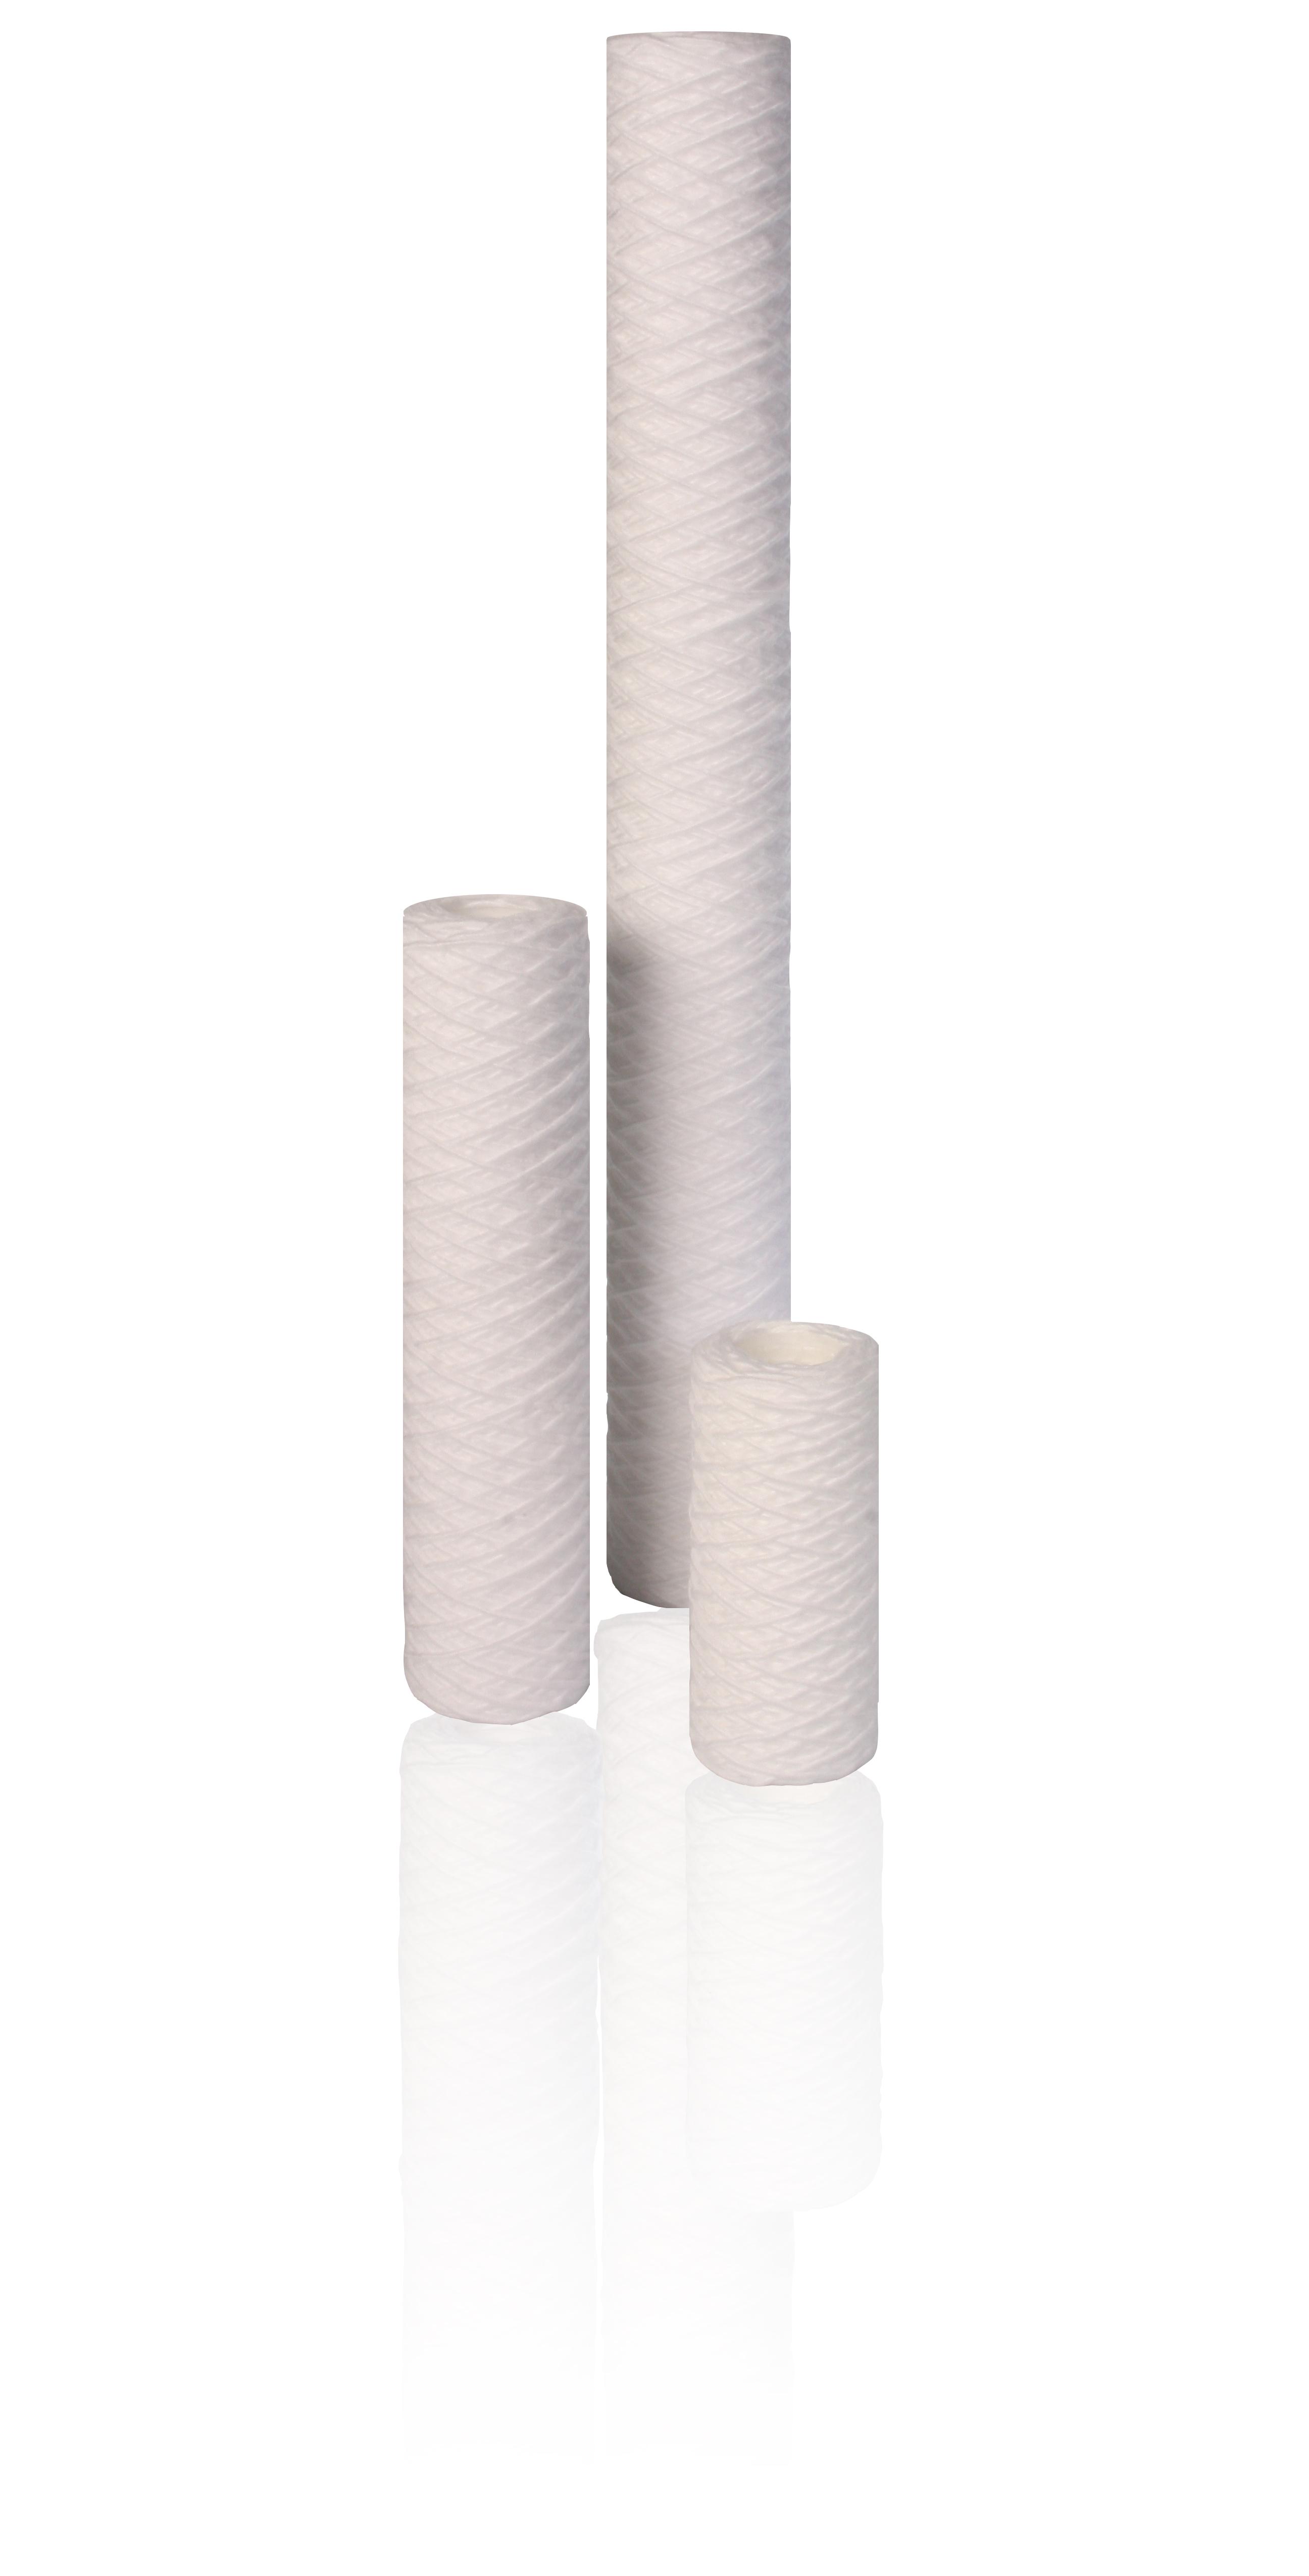 Filtertasse Wasserfilter Filtertasse 20 Zoll 1 1//2 Zoll IG Wasserenthärtung